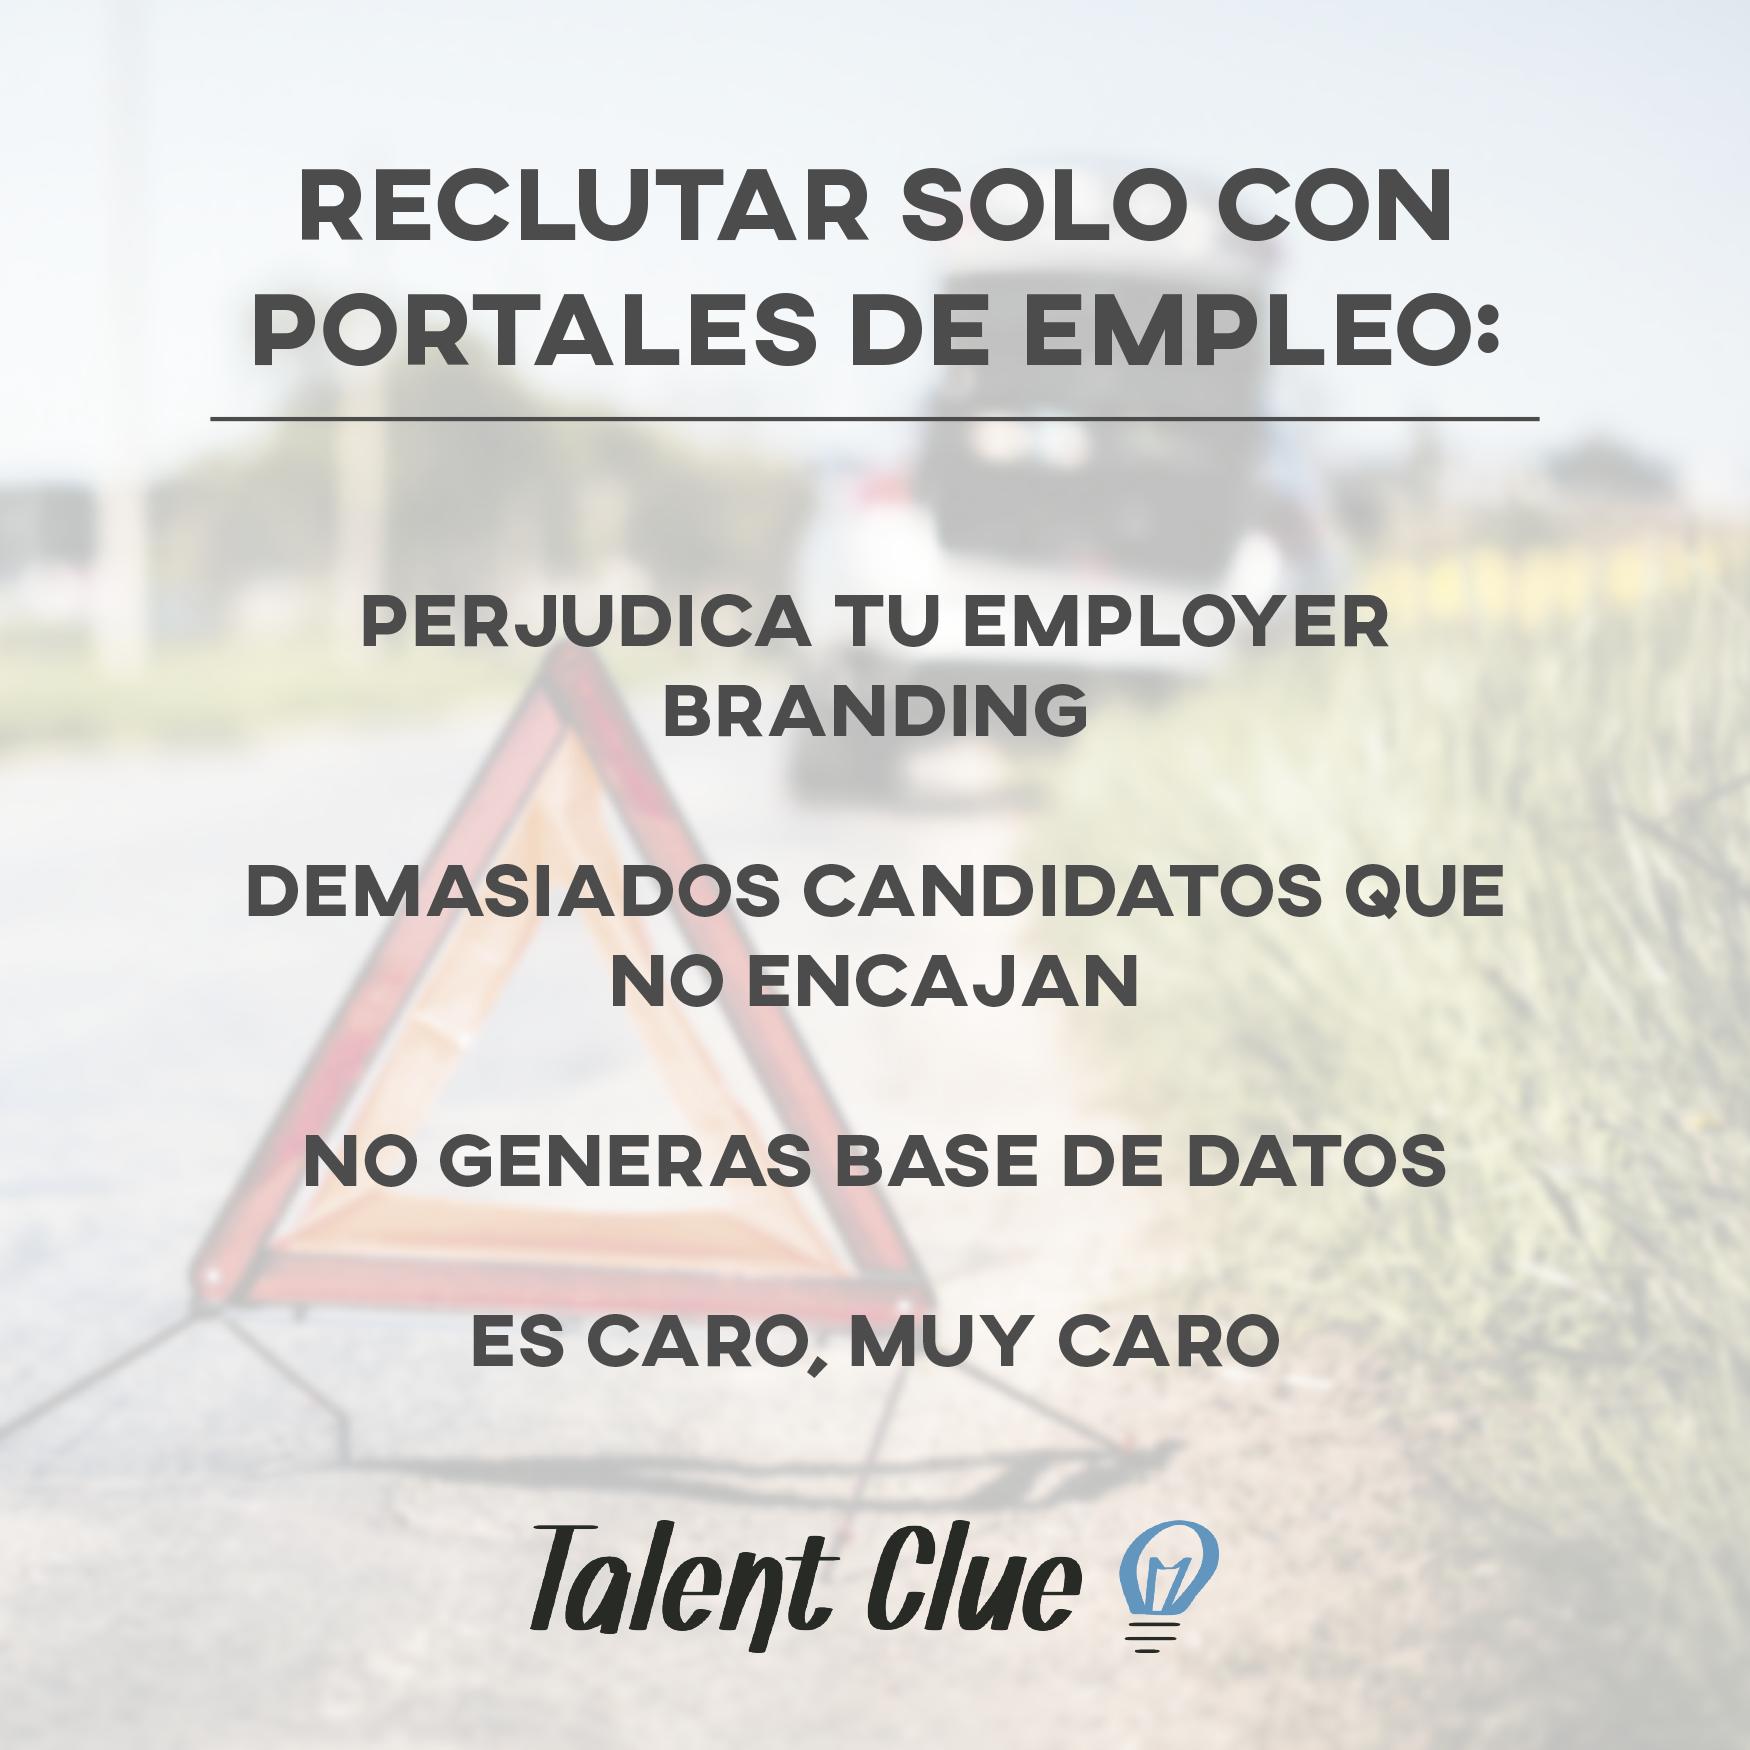 Reclutar_solo_con_portales_de_empleo.png